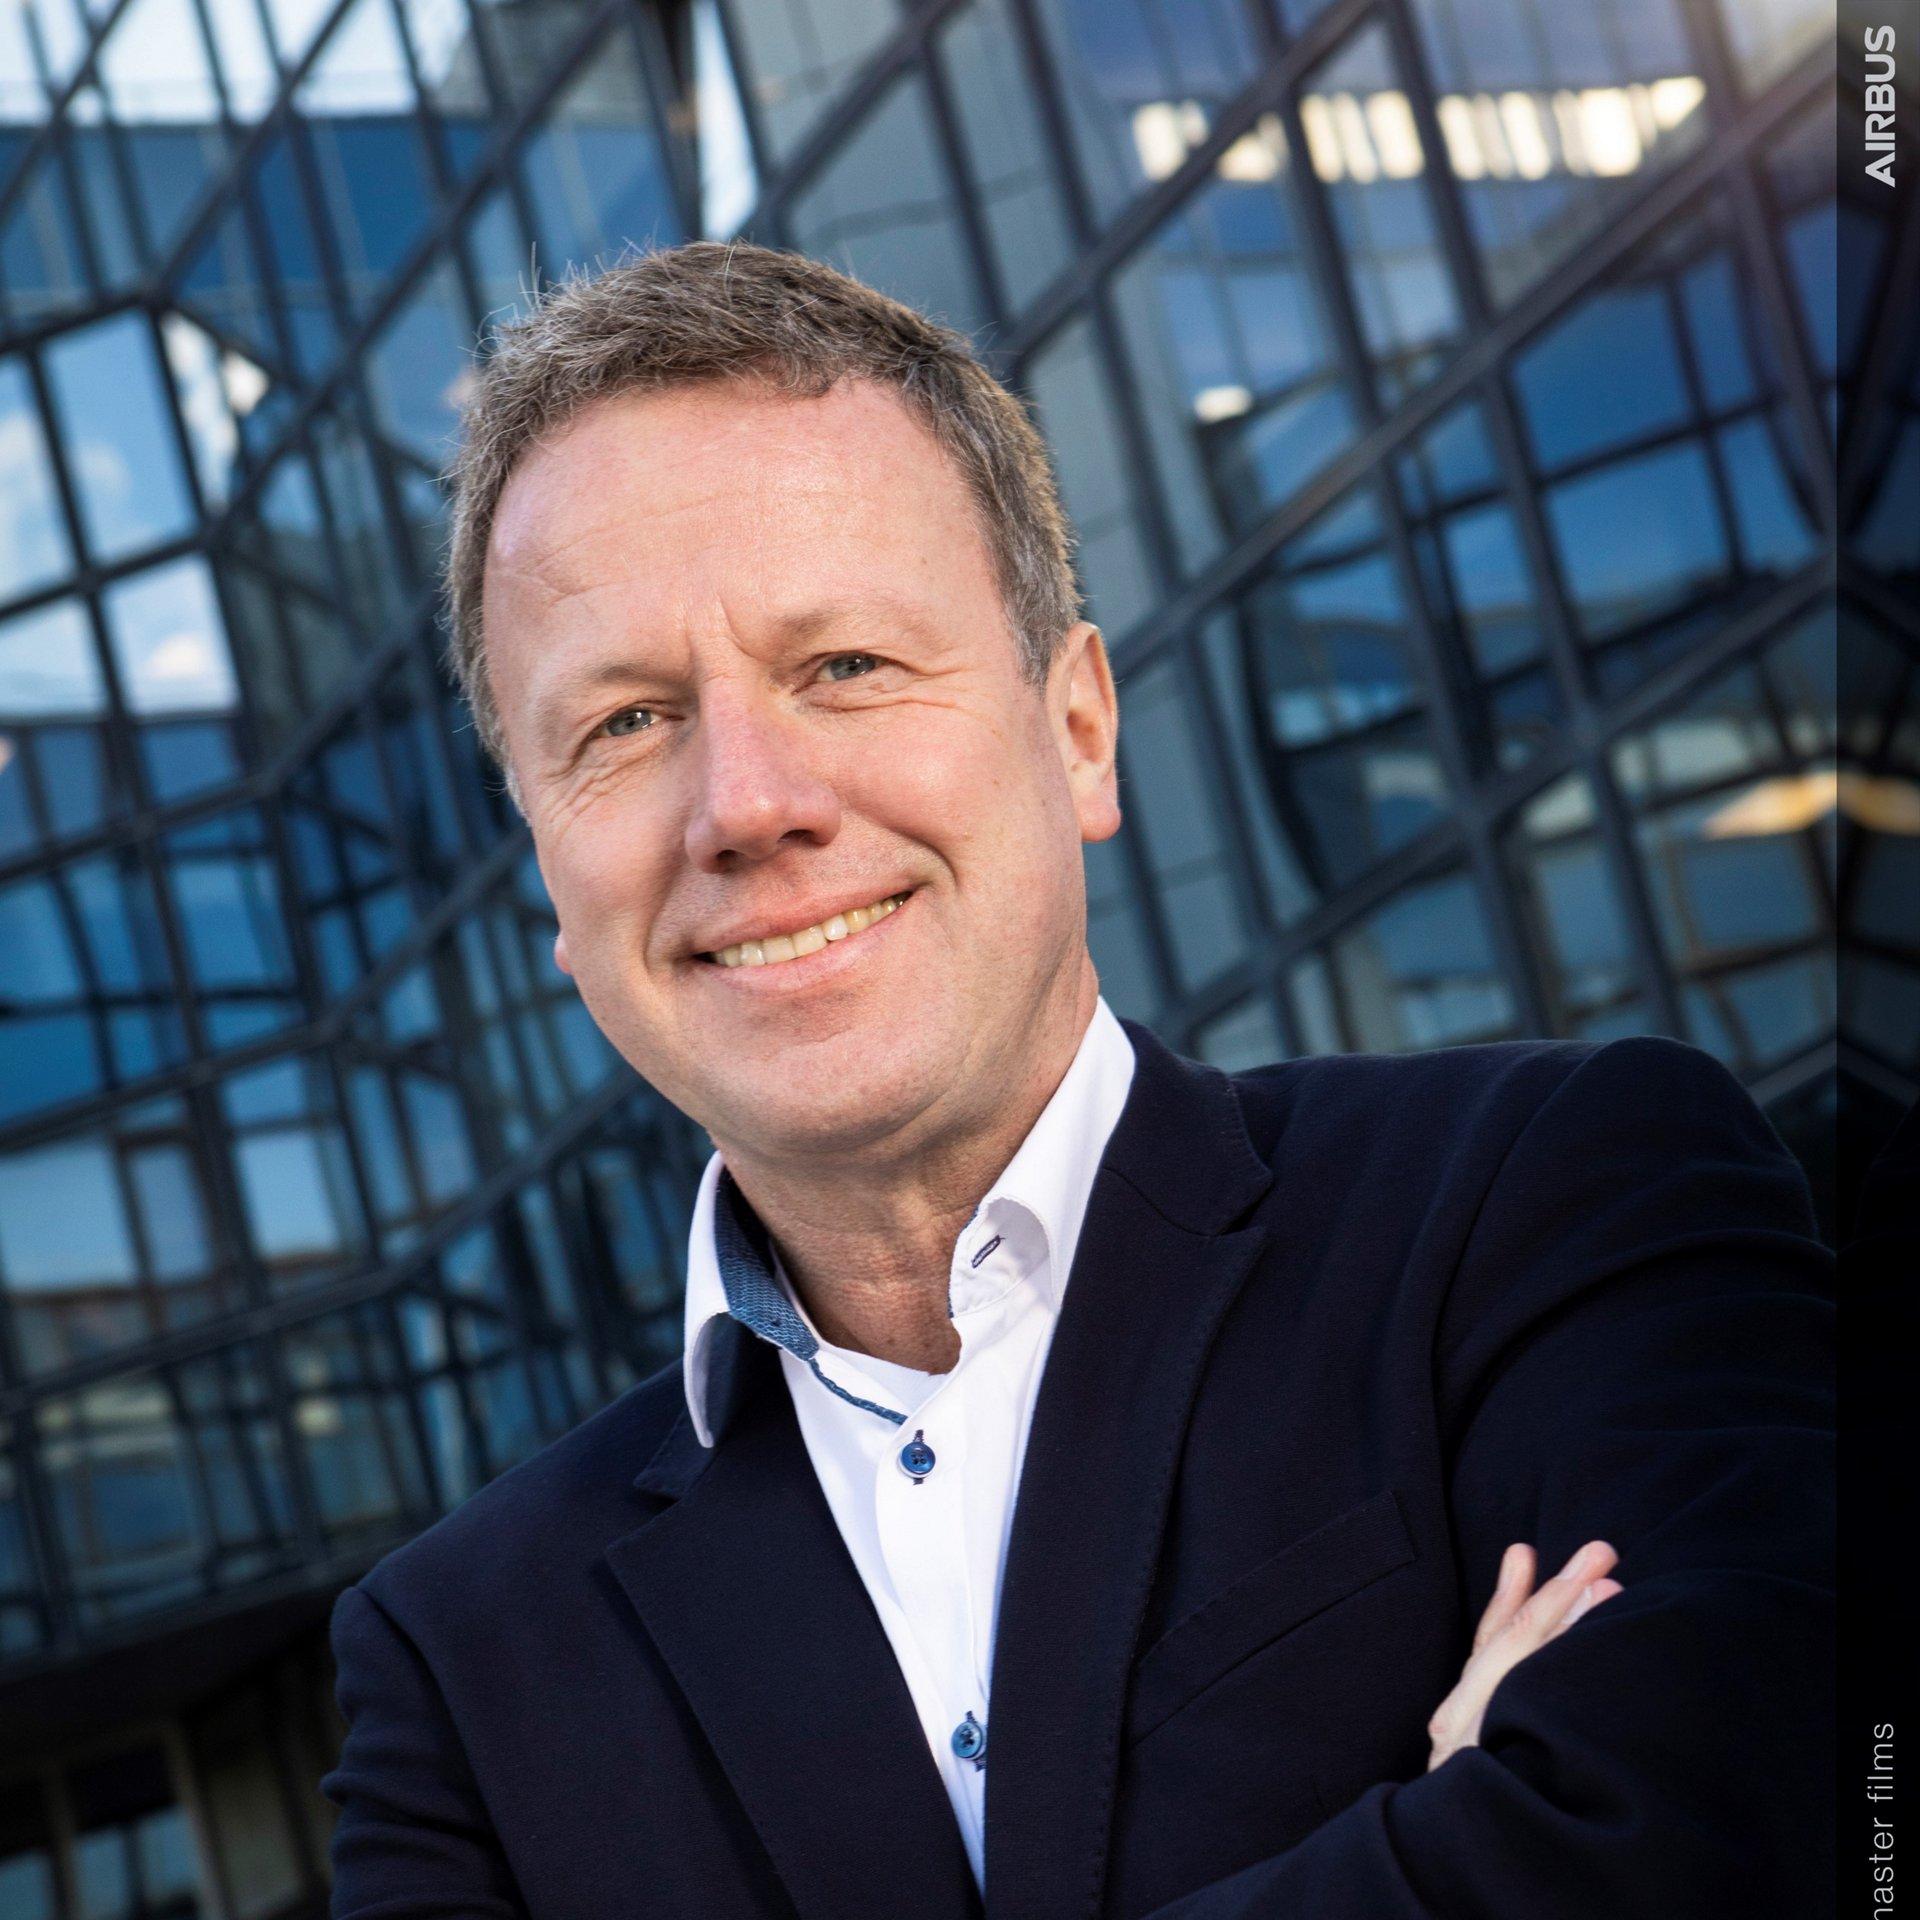 Senior Vice President, Head of Airbus Customer Services